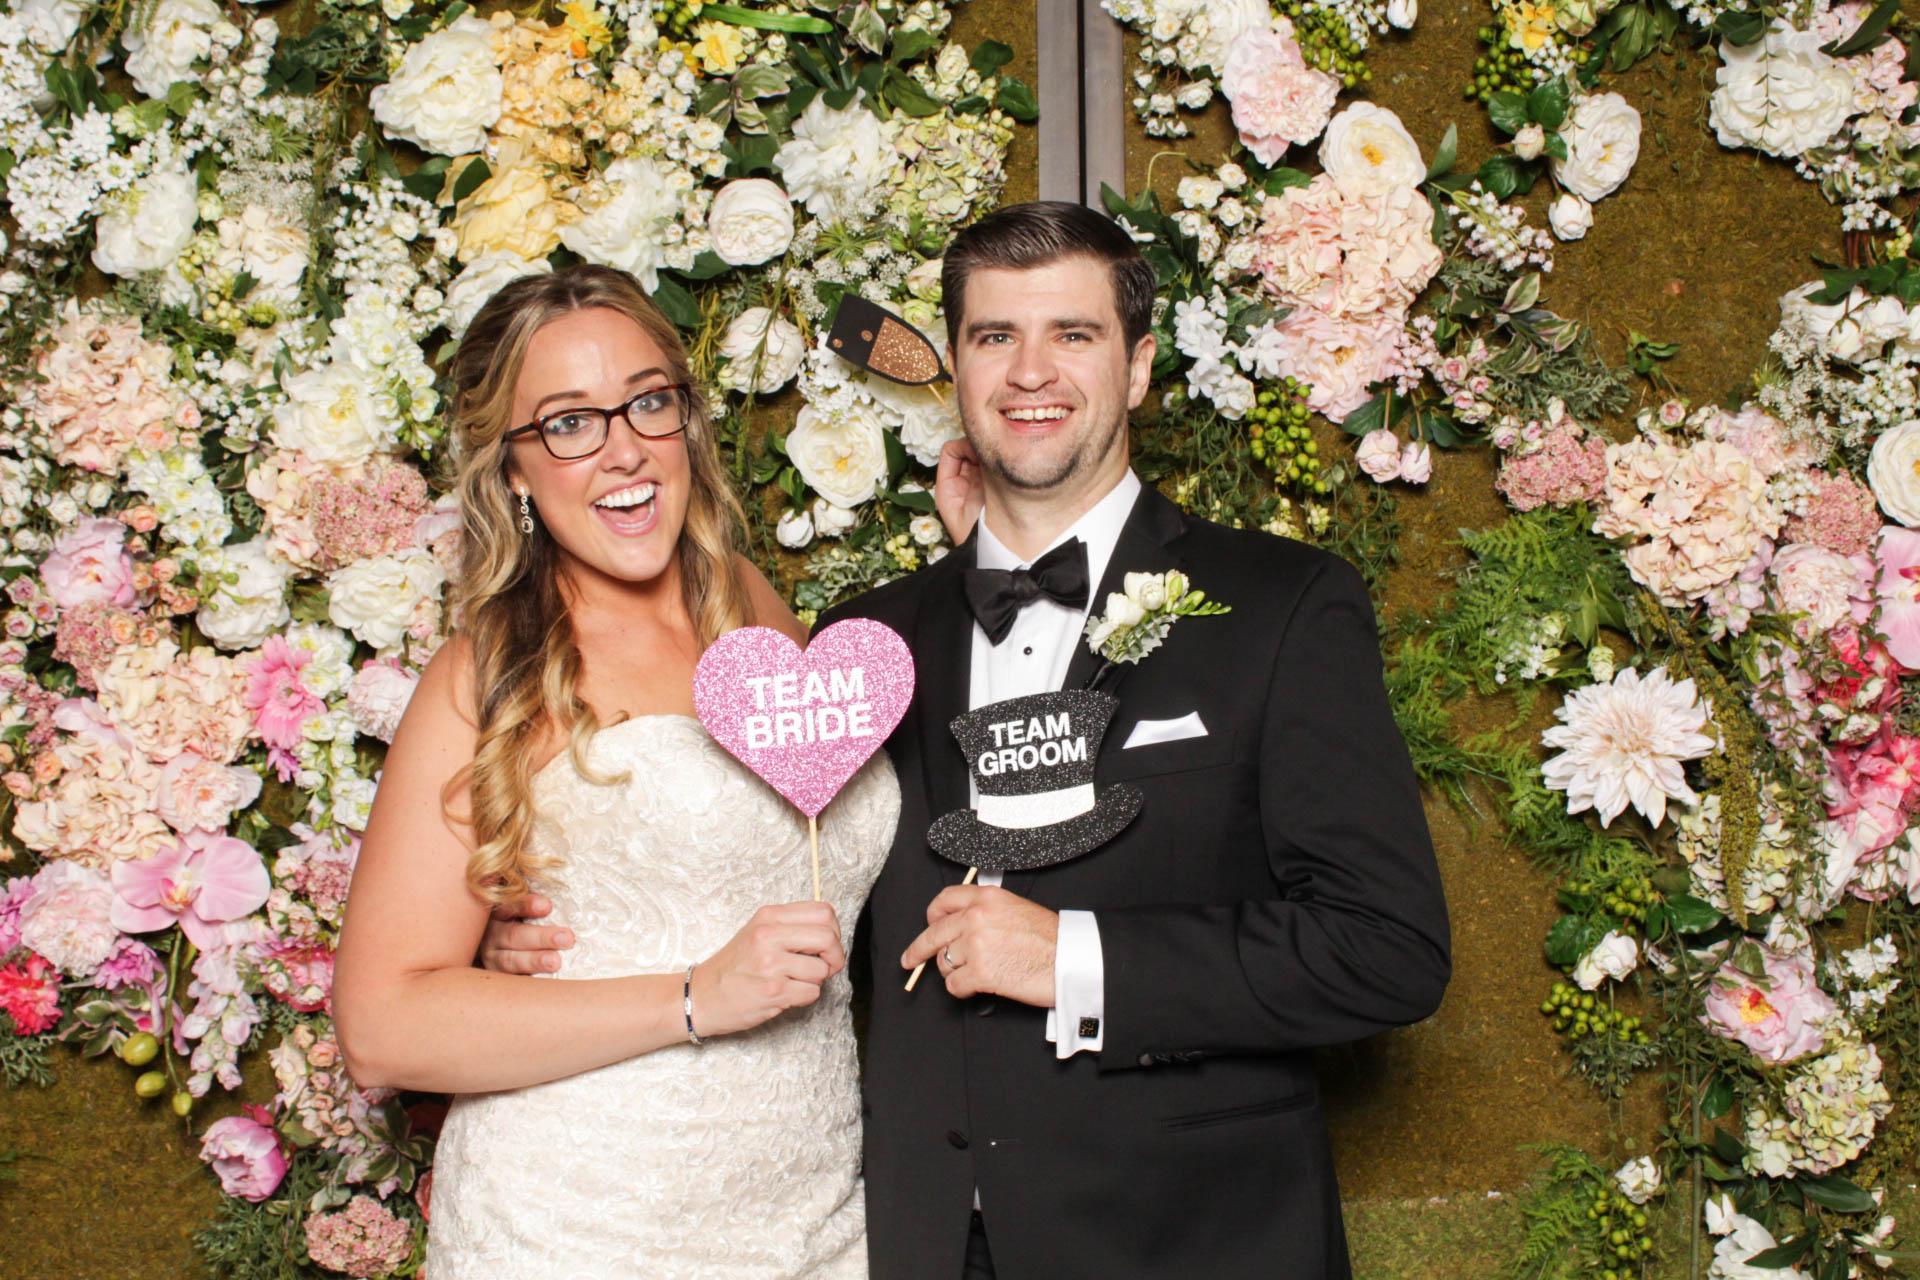 Wedding Photo Booth Rental Philadelphia